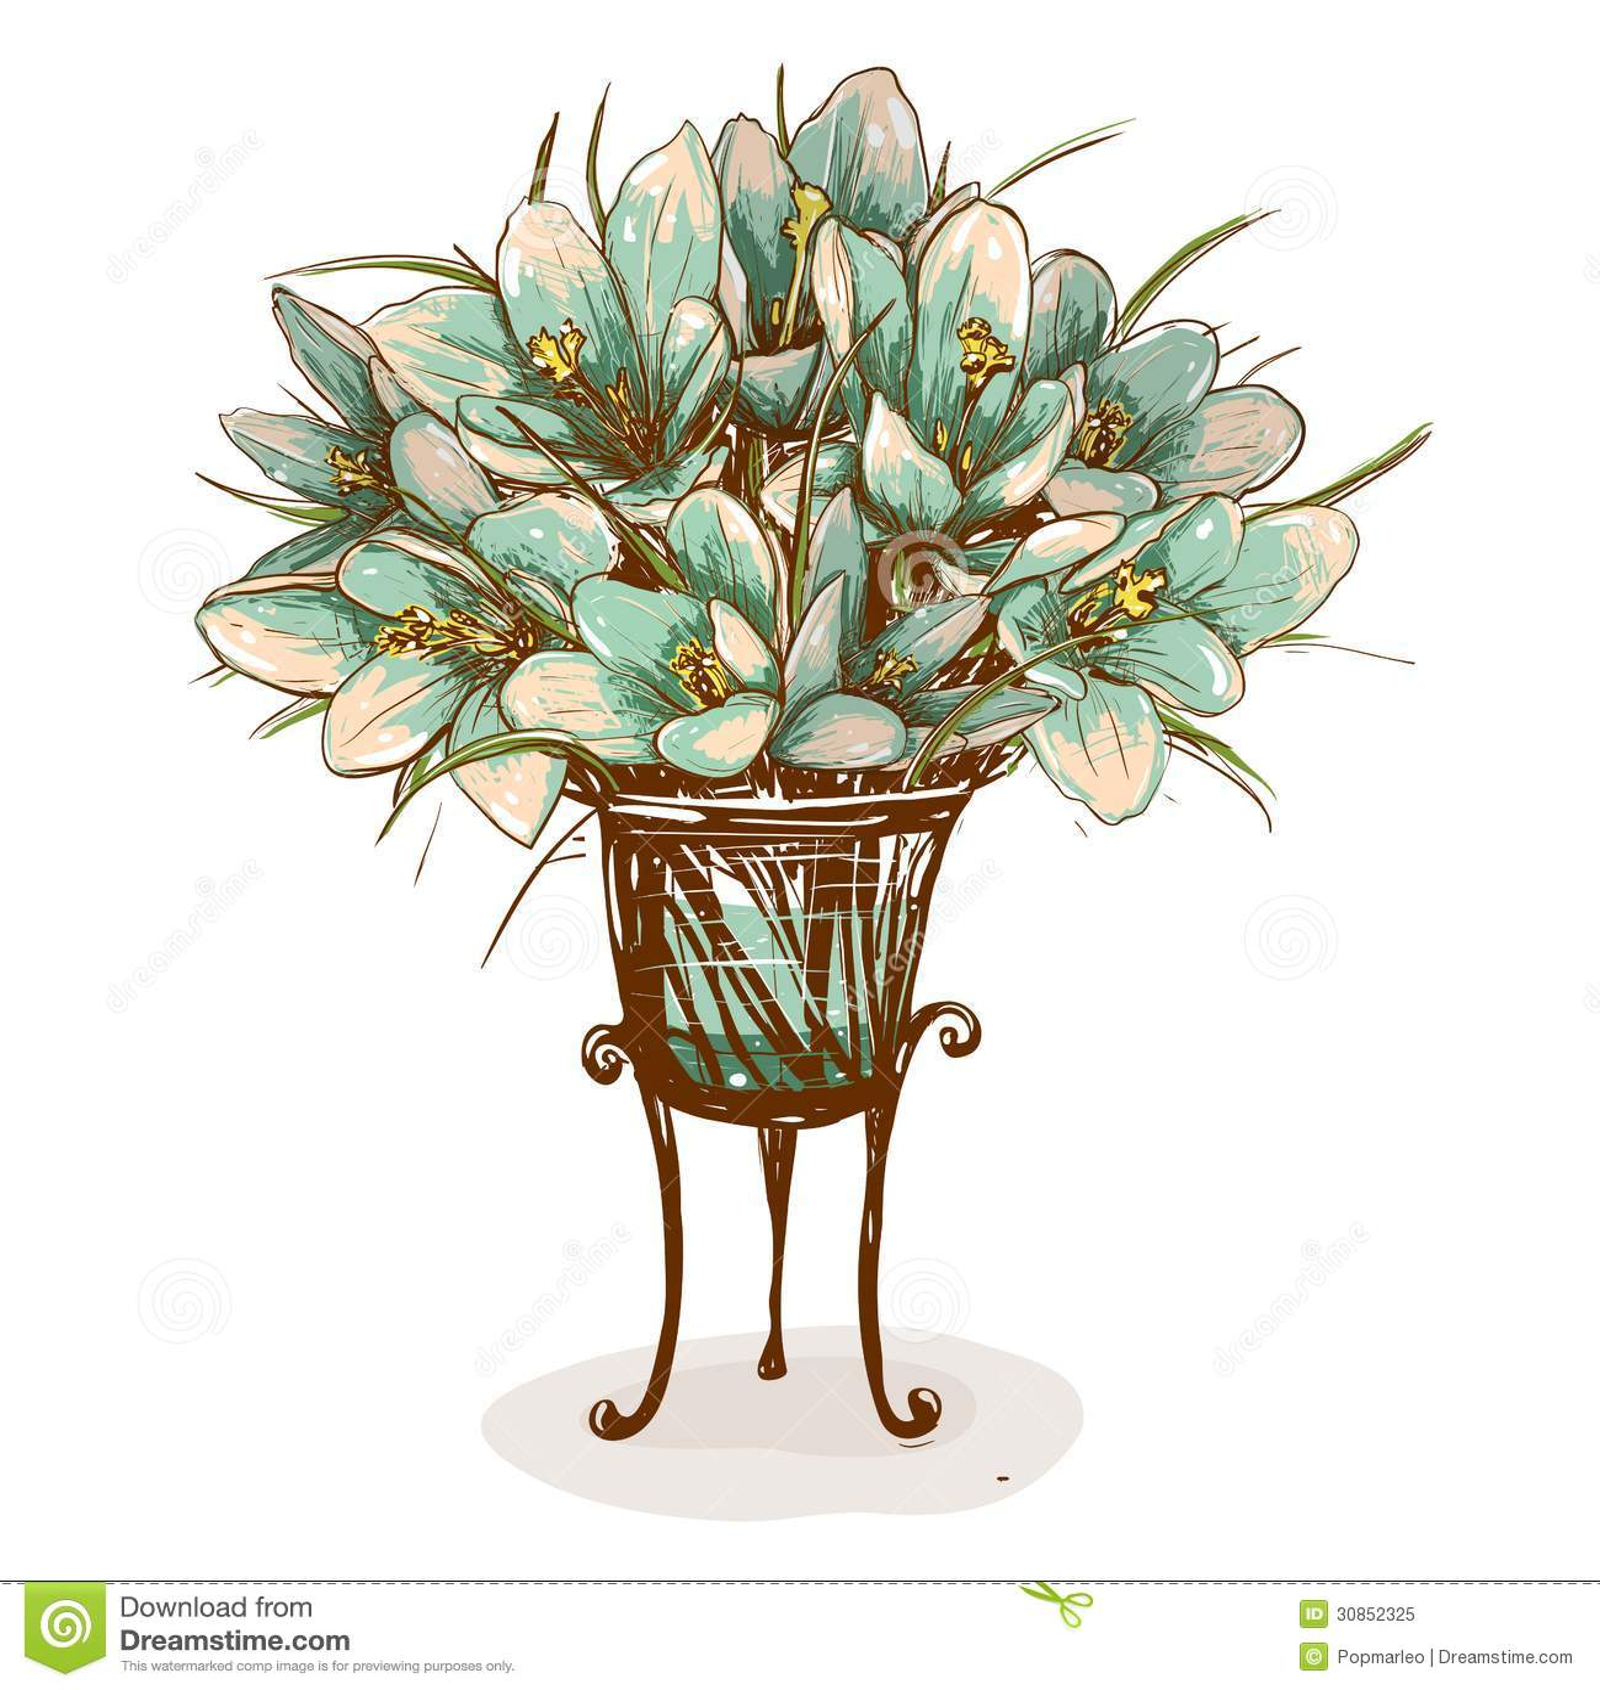 Vintage flowers in vase composition stock vector illustration of vintage flowers in vase composition reviewsmspy